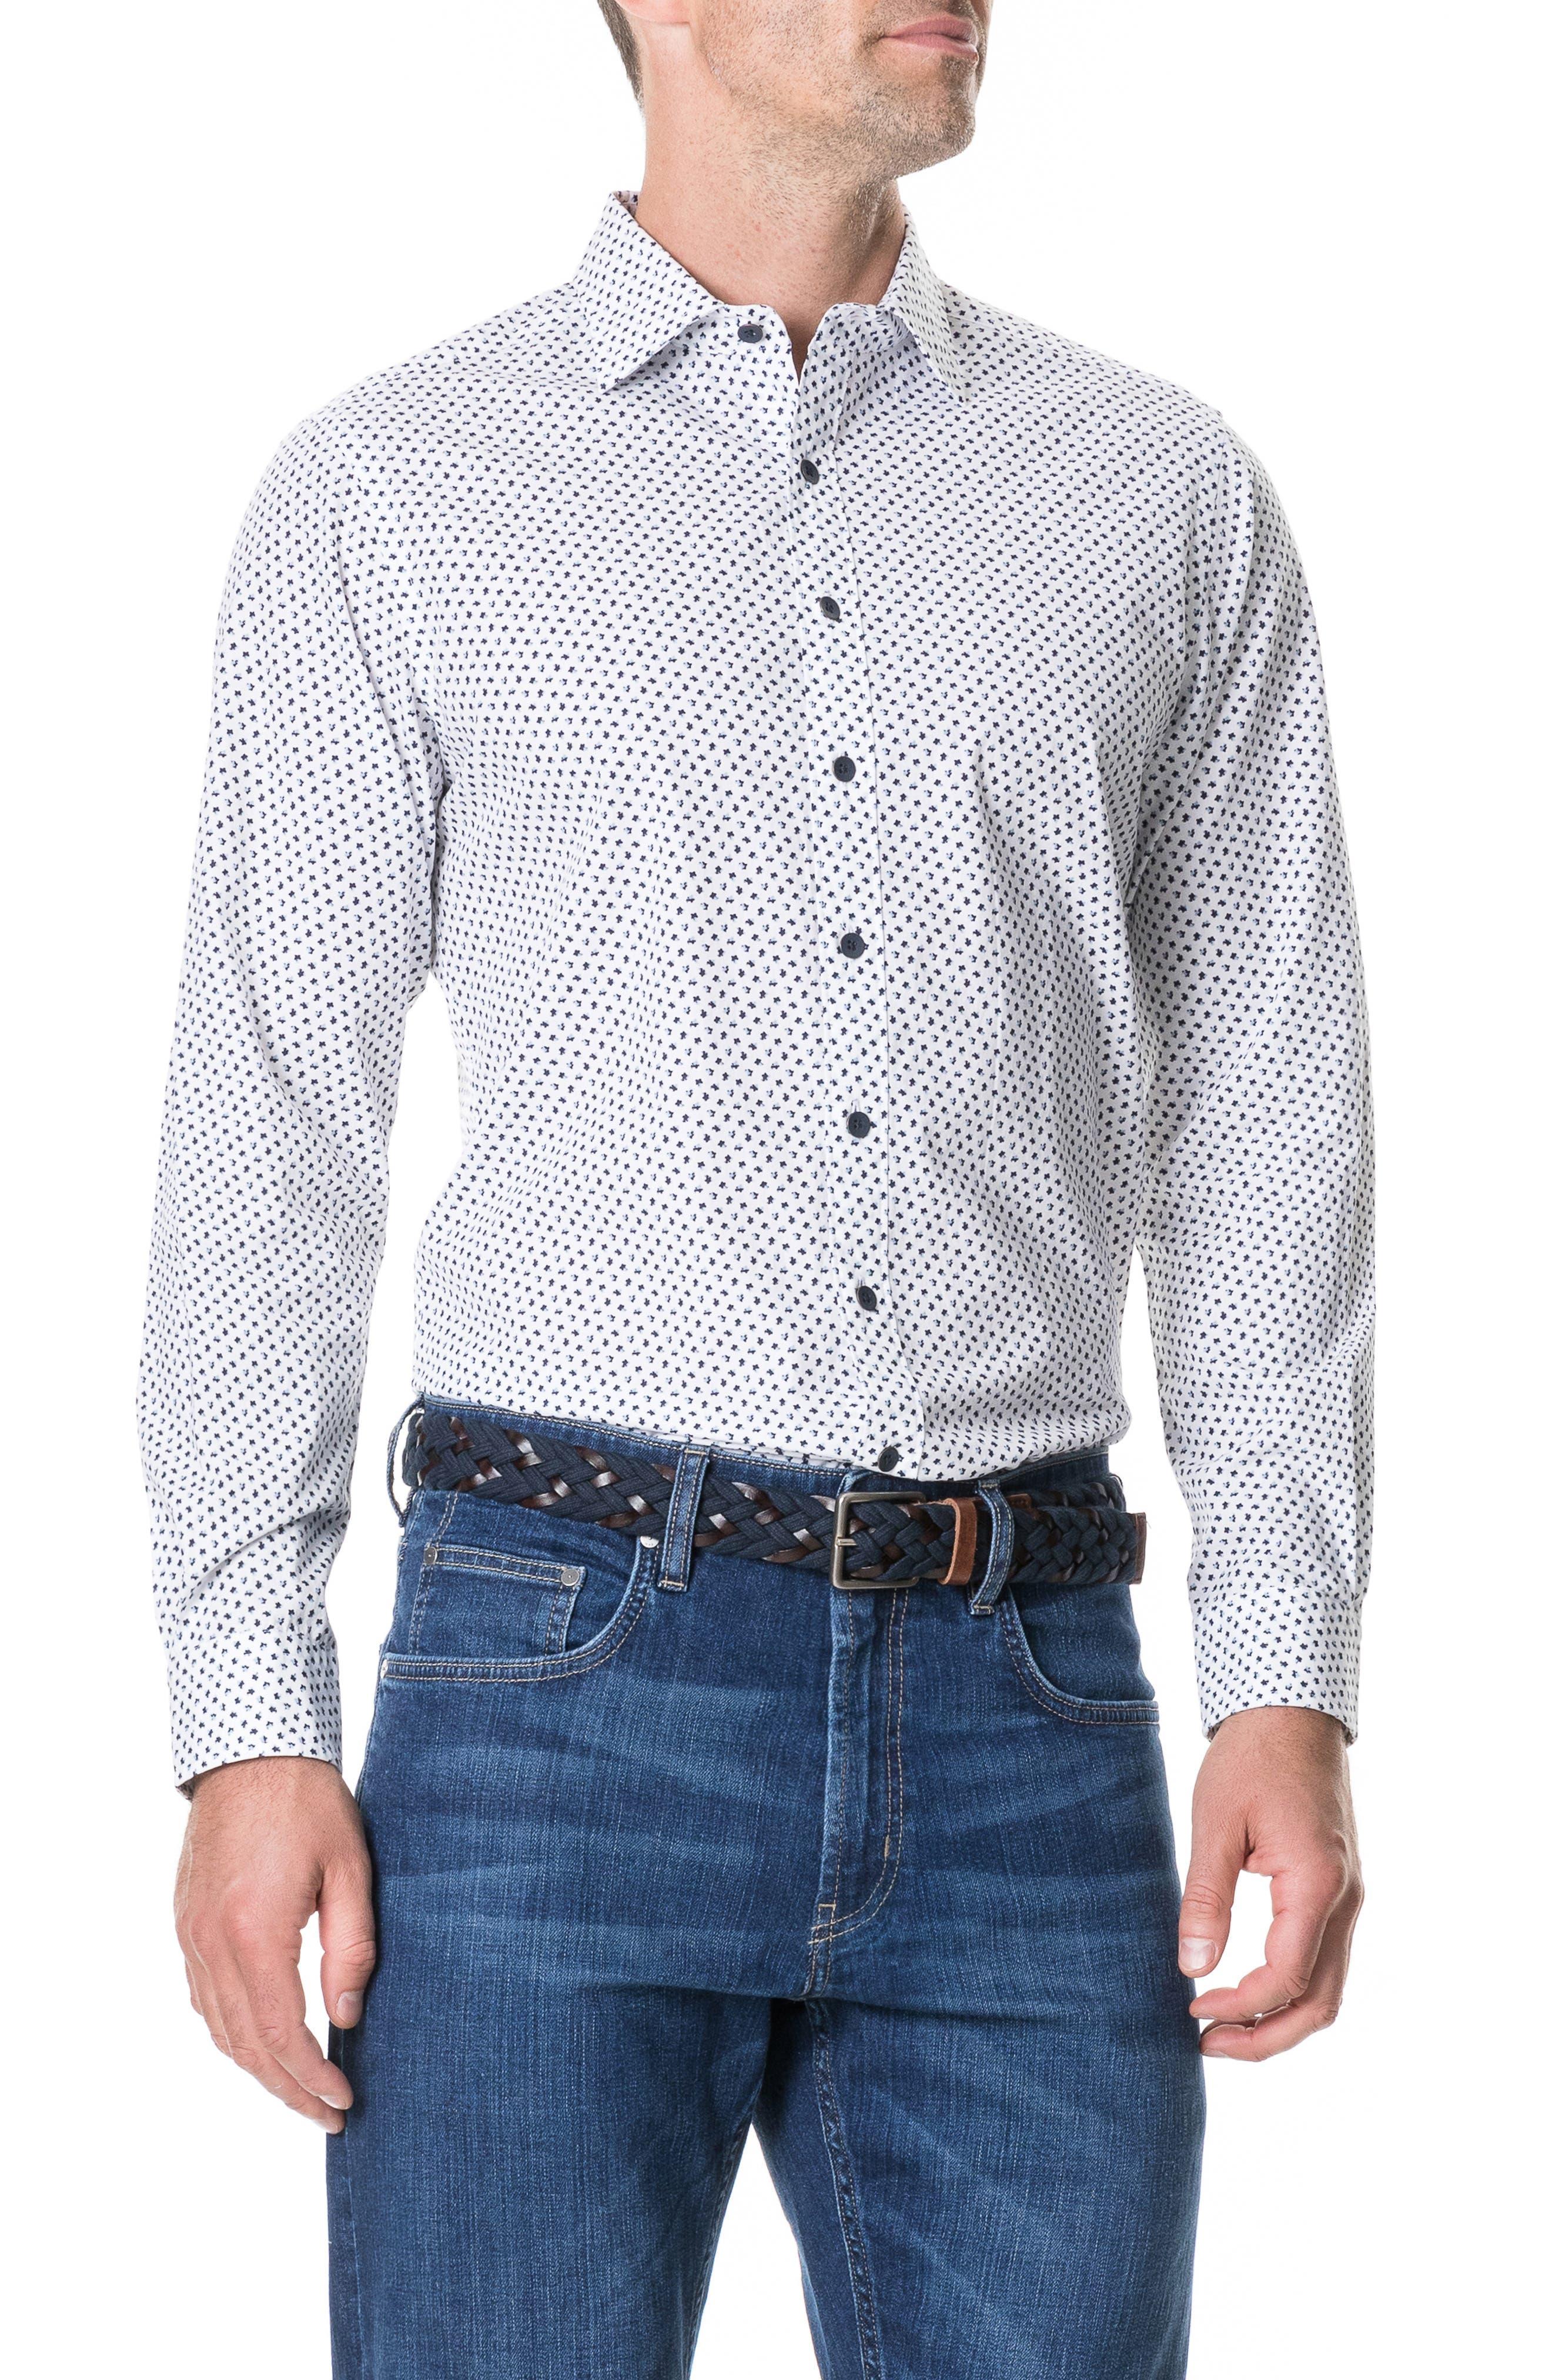 RODD & GUNN Northcross Sport Shirt, Main, color, IVORY